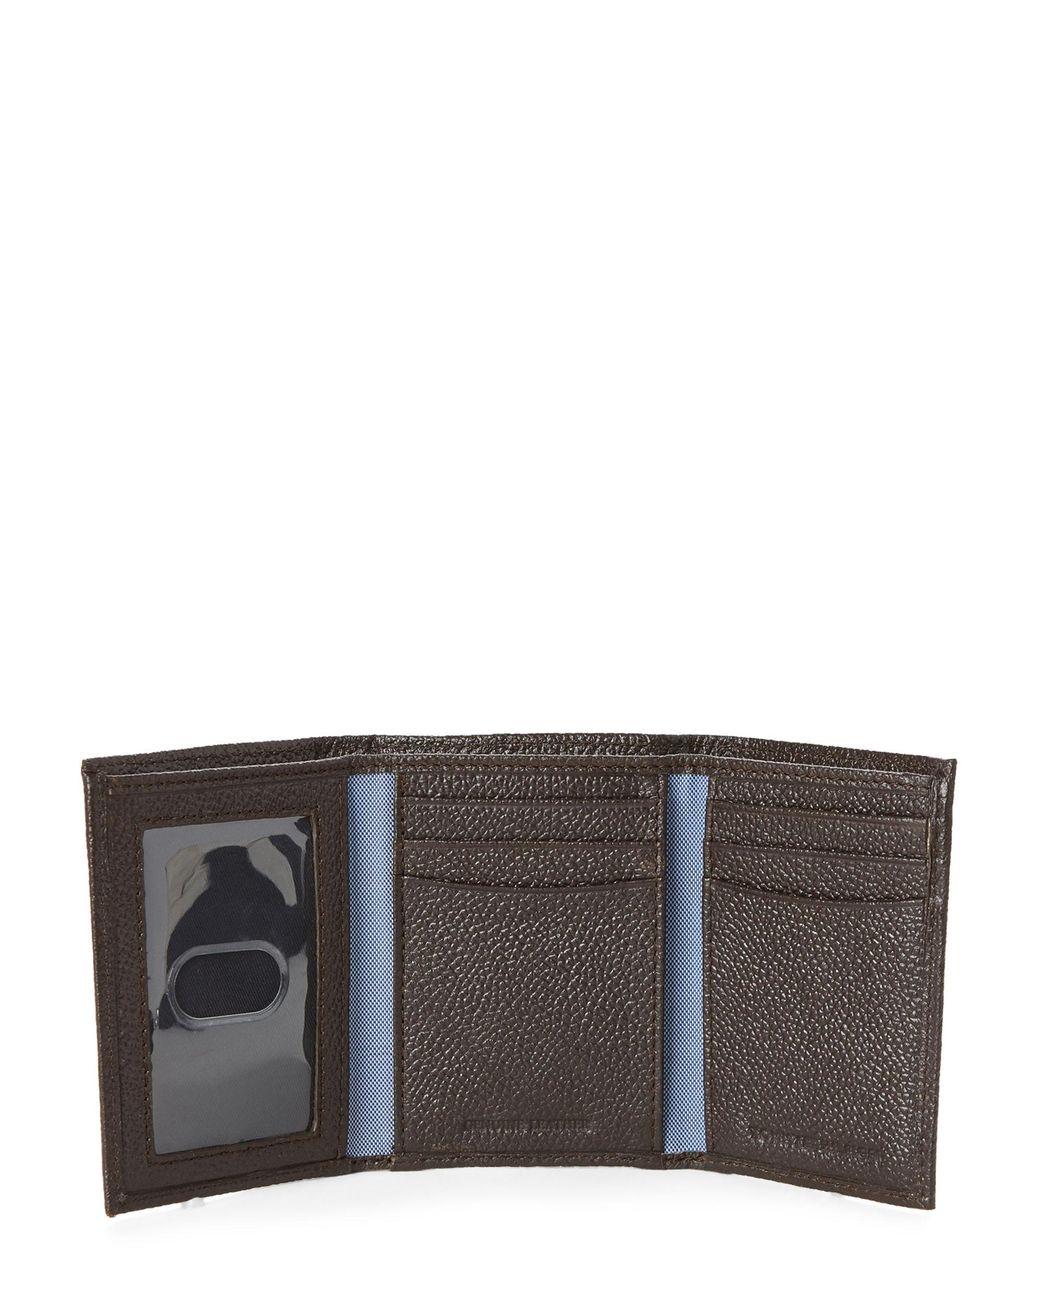 62027231 Tommy Hilfiger Hunter Leather Tri-fold Wallet in Brown for Men - Lyst